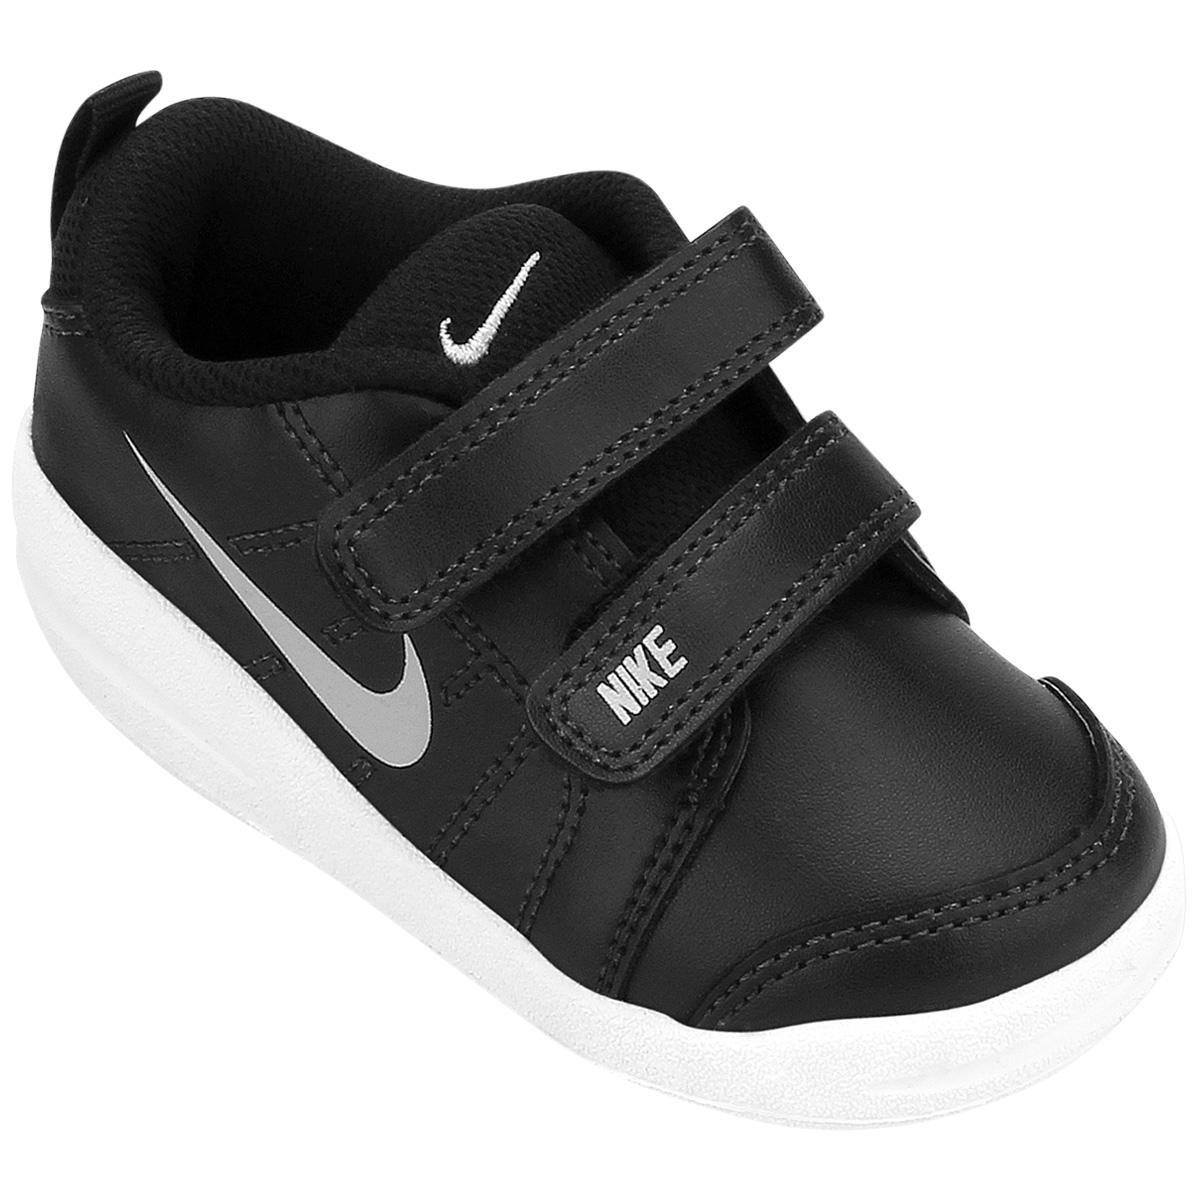 6414b786ce0d7 Tênis Nike Pico LT TDV Infantil - Compre Agora